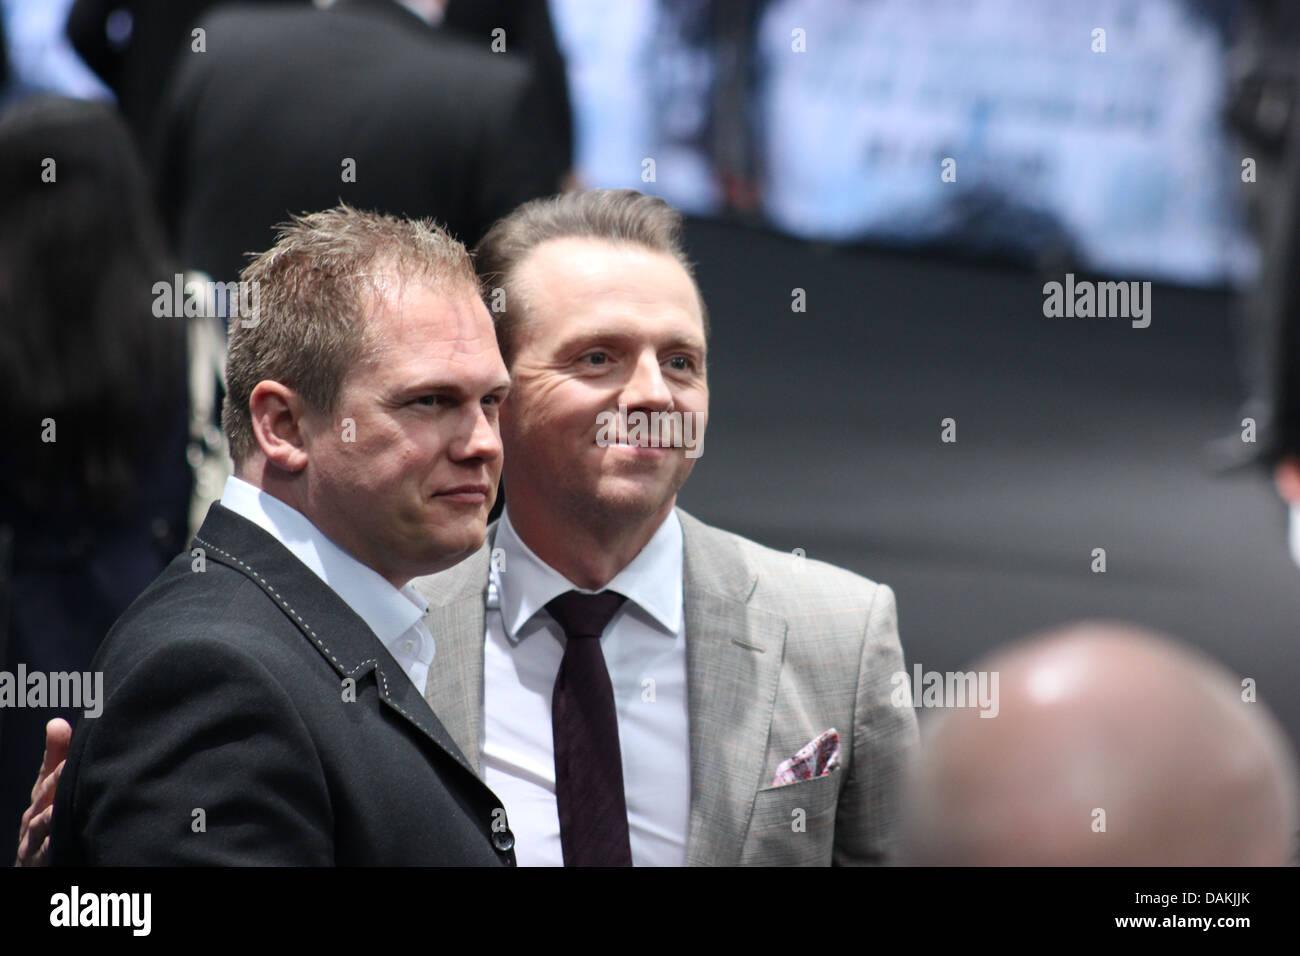 Simon Pegg - Germany premiere of 'Star Trek Into Darkness' at CineStar at Potsdamer Platz, Berlin - April - Stock Image